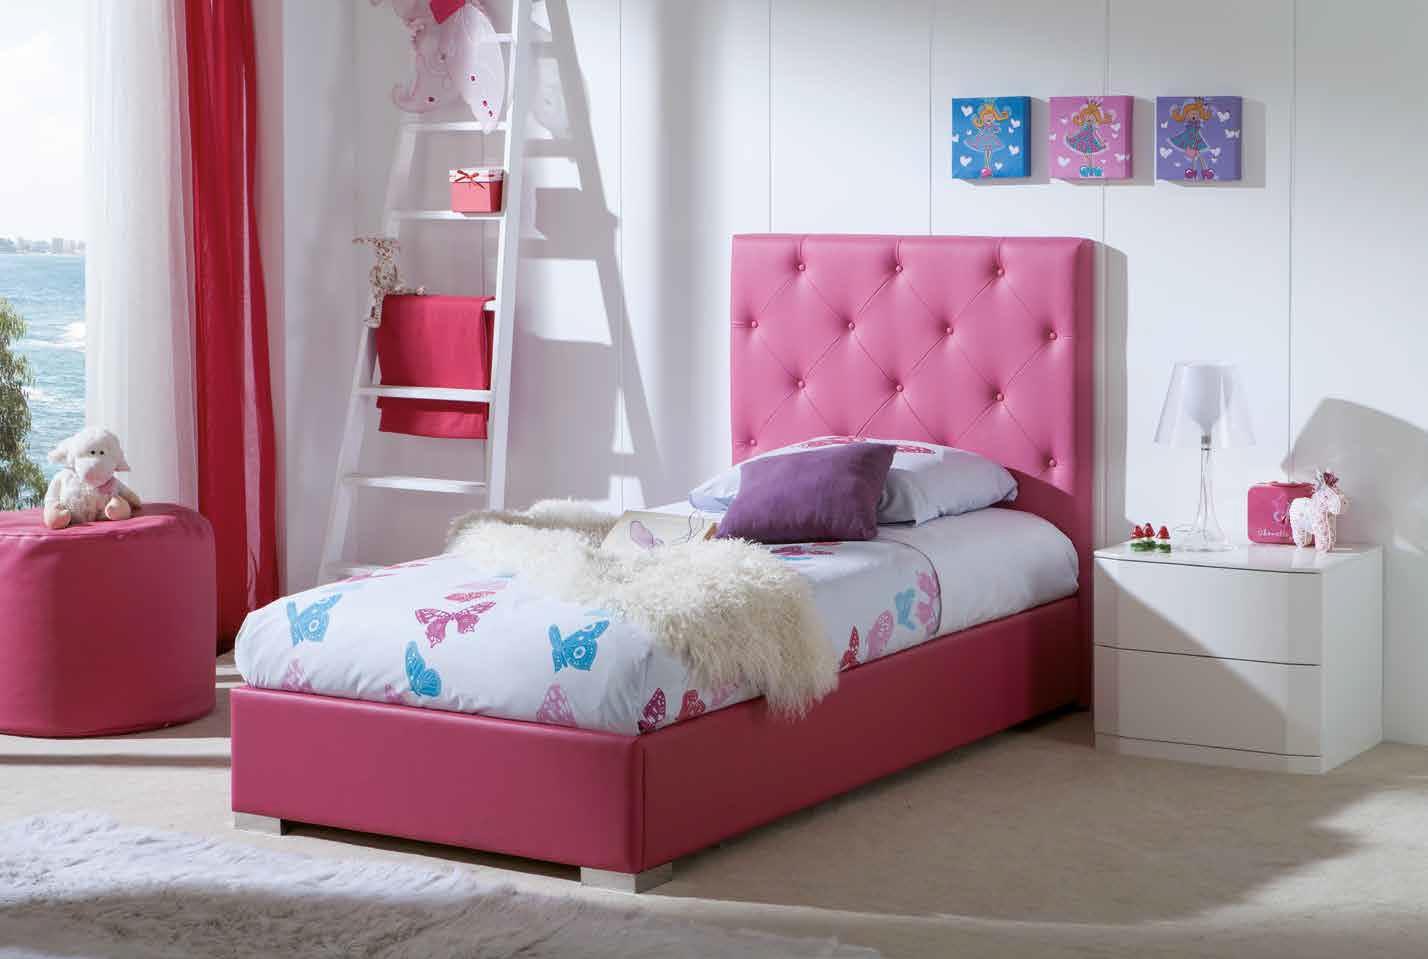 pink single bed with silver block legs, roz krevati paidiko me asimenia podia, koritsistiko domatio krevati paidiko, girly bed,